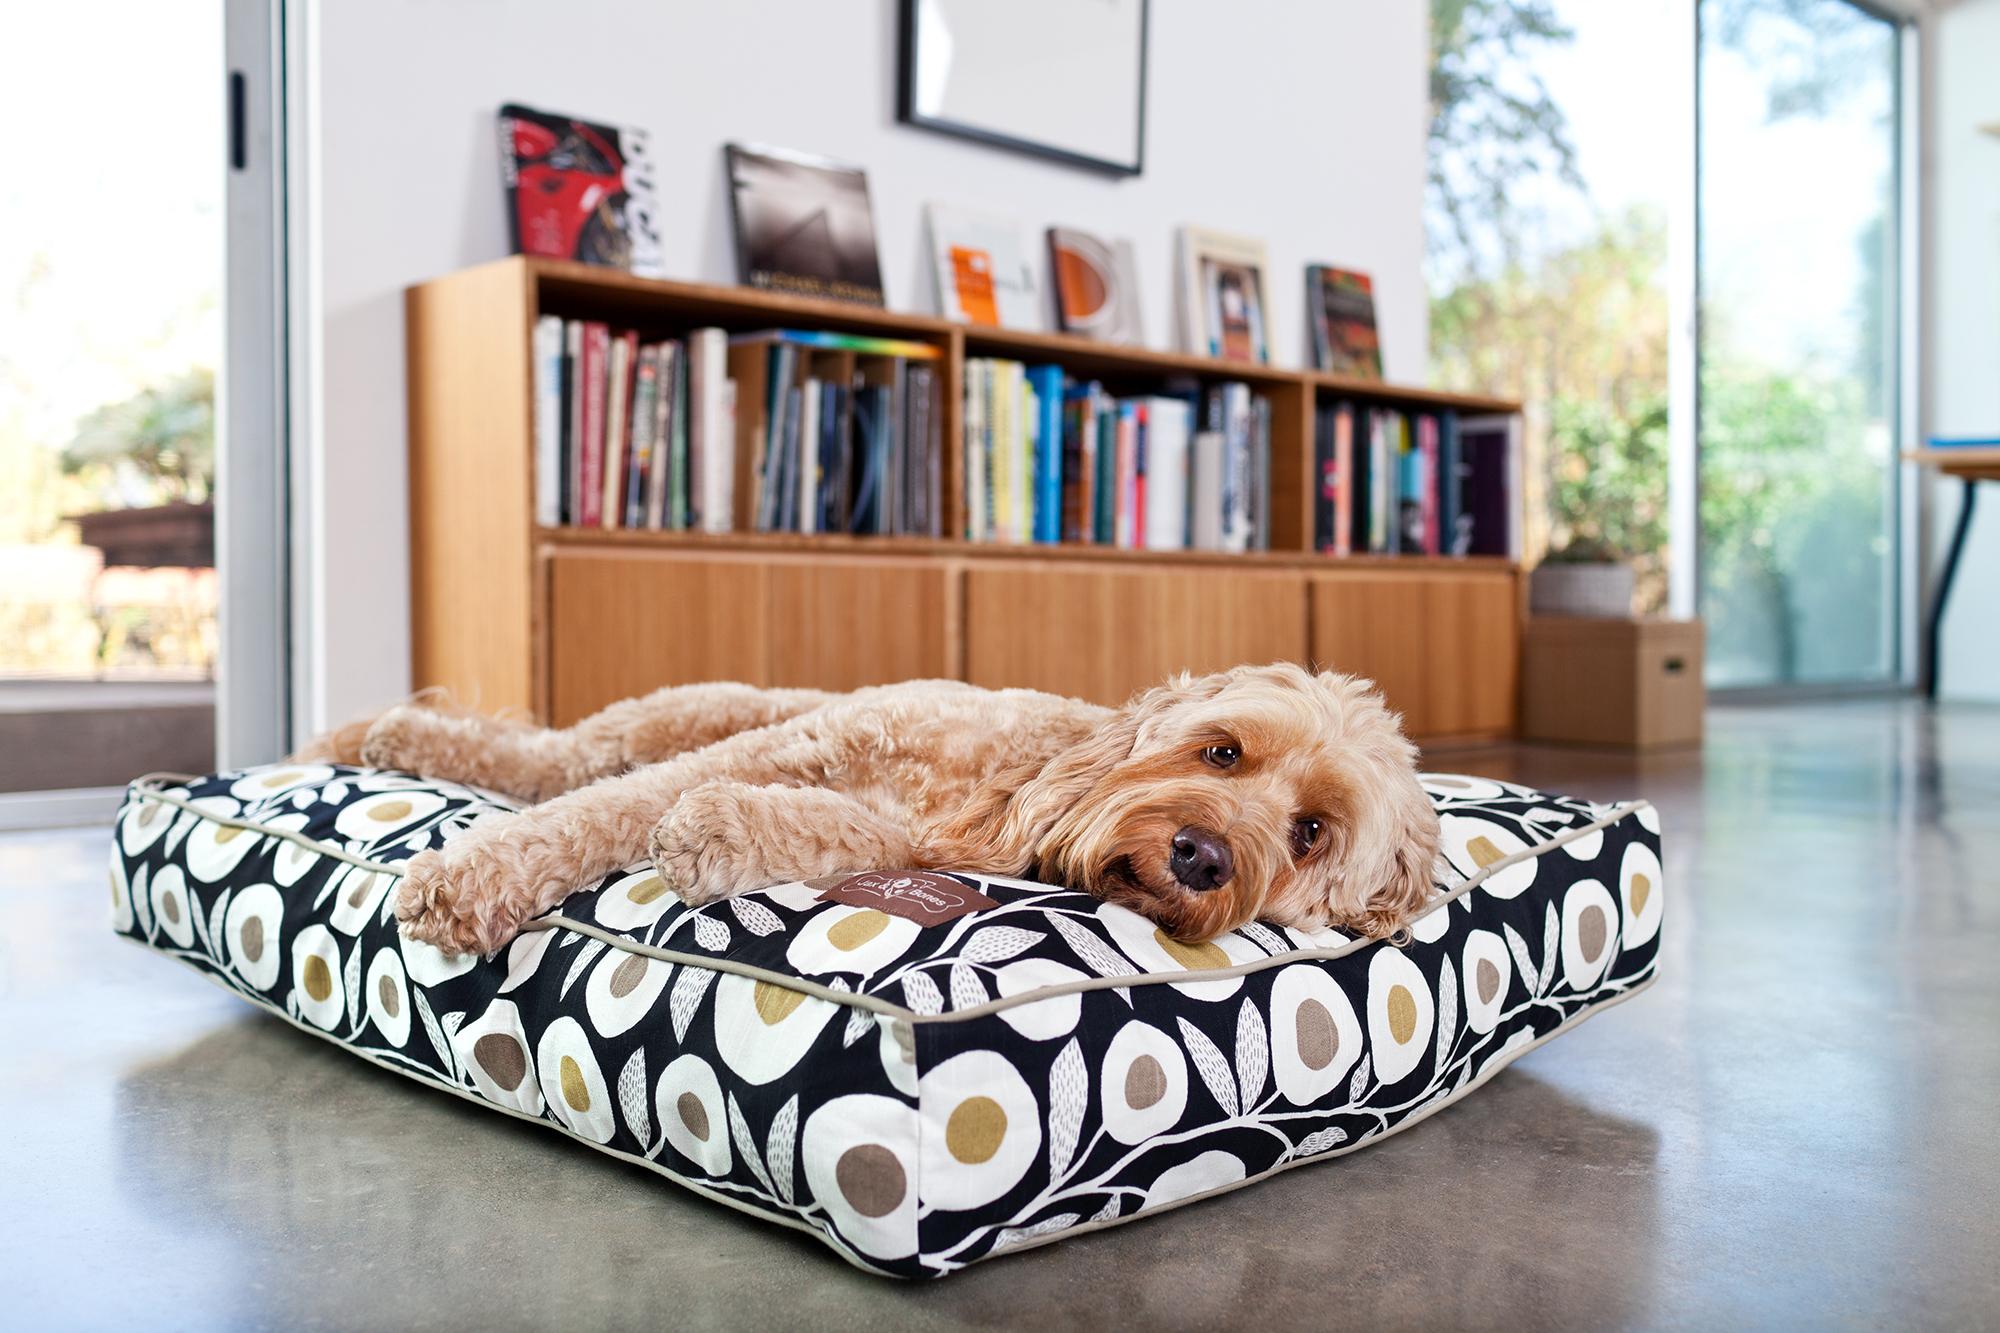 pillow-everyday-cotton-dandy-lifestyle-2-2000x1333-72dpi-rgb.jpg